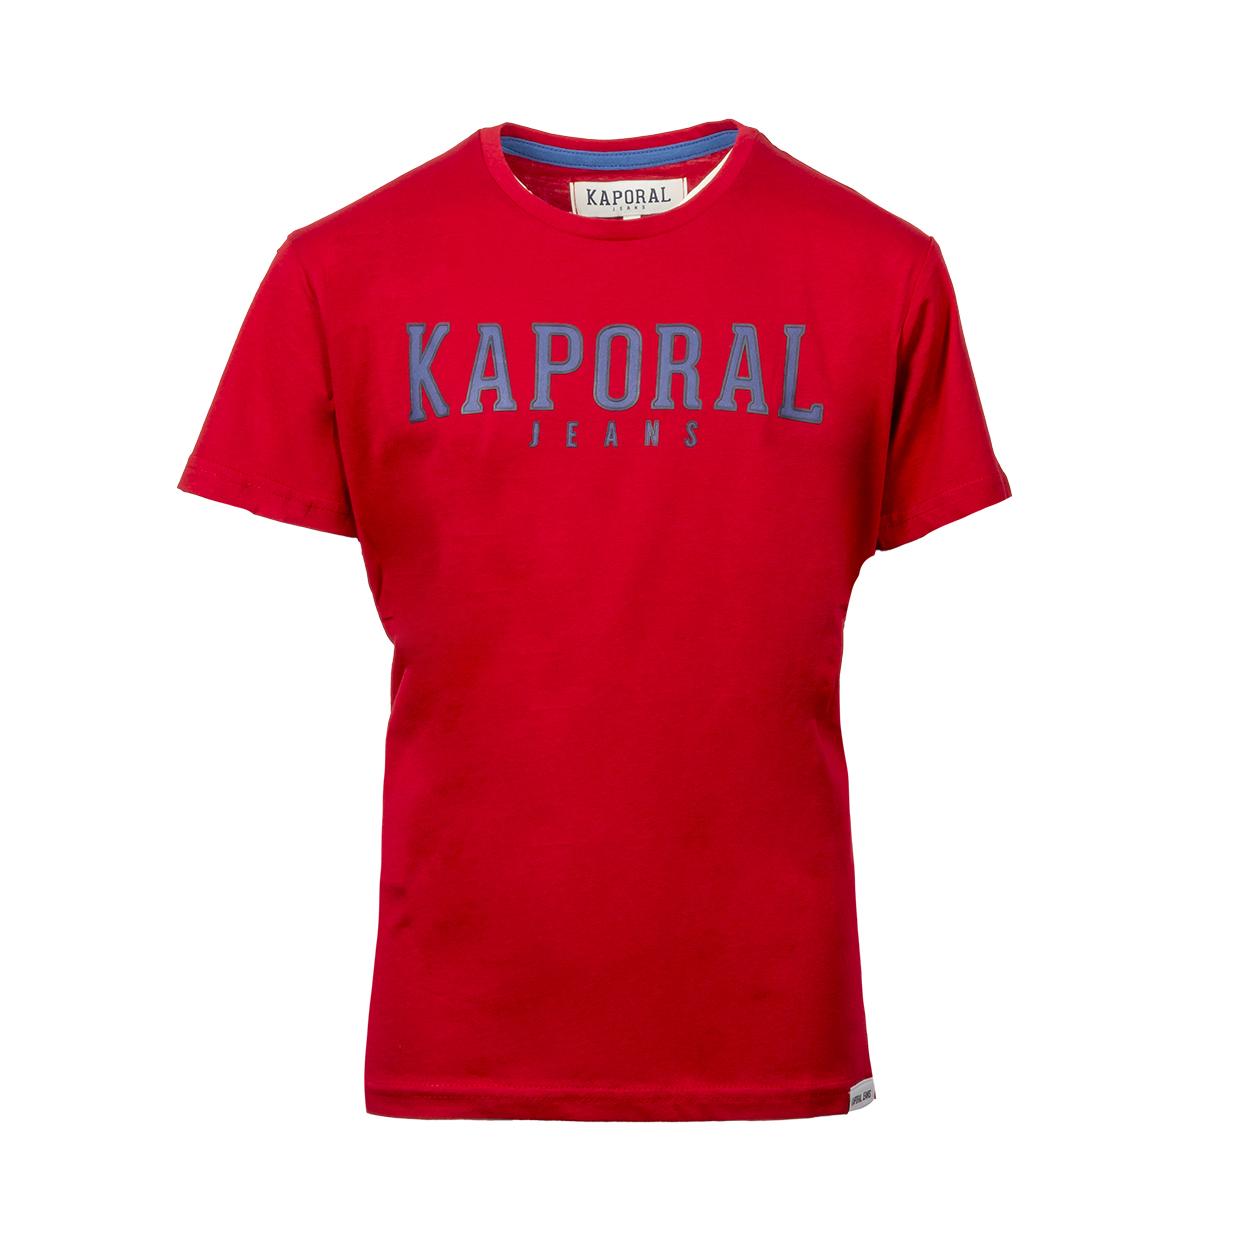 Tee-shirt col rond  orad en coton rouge floqué en noir